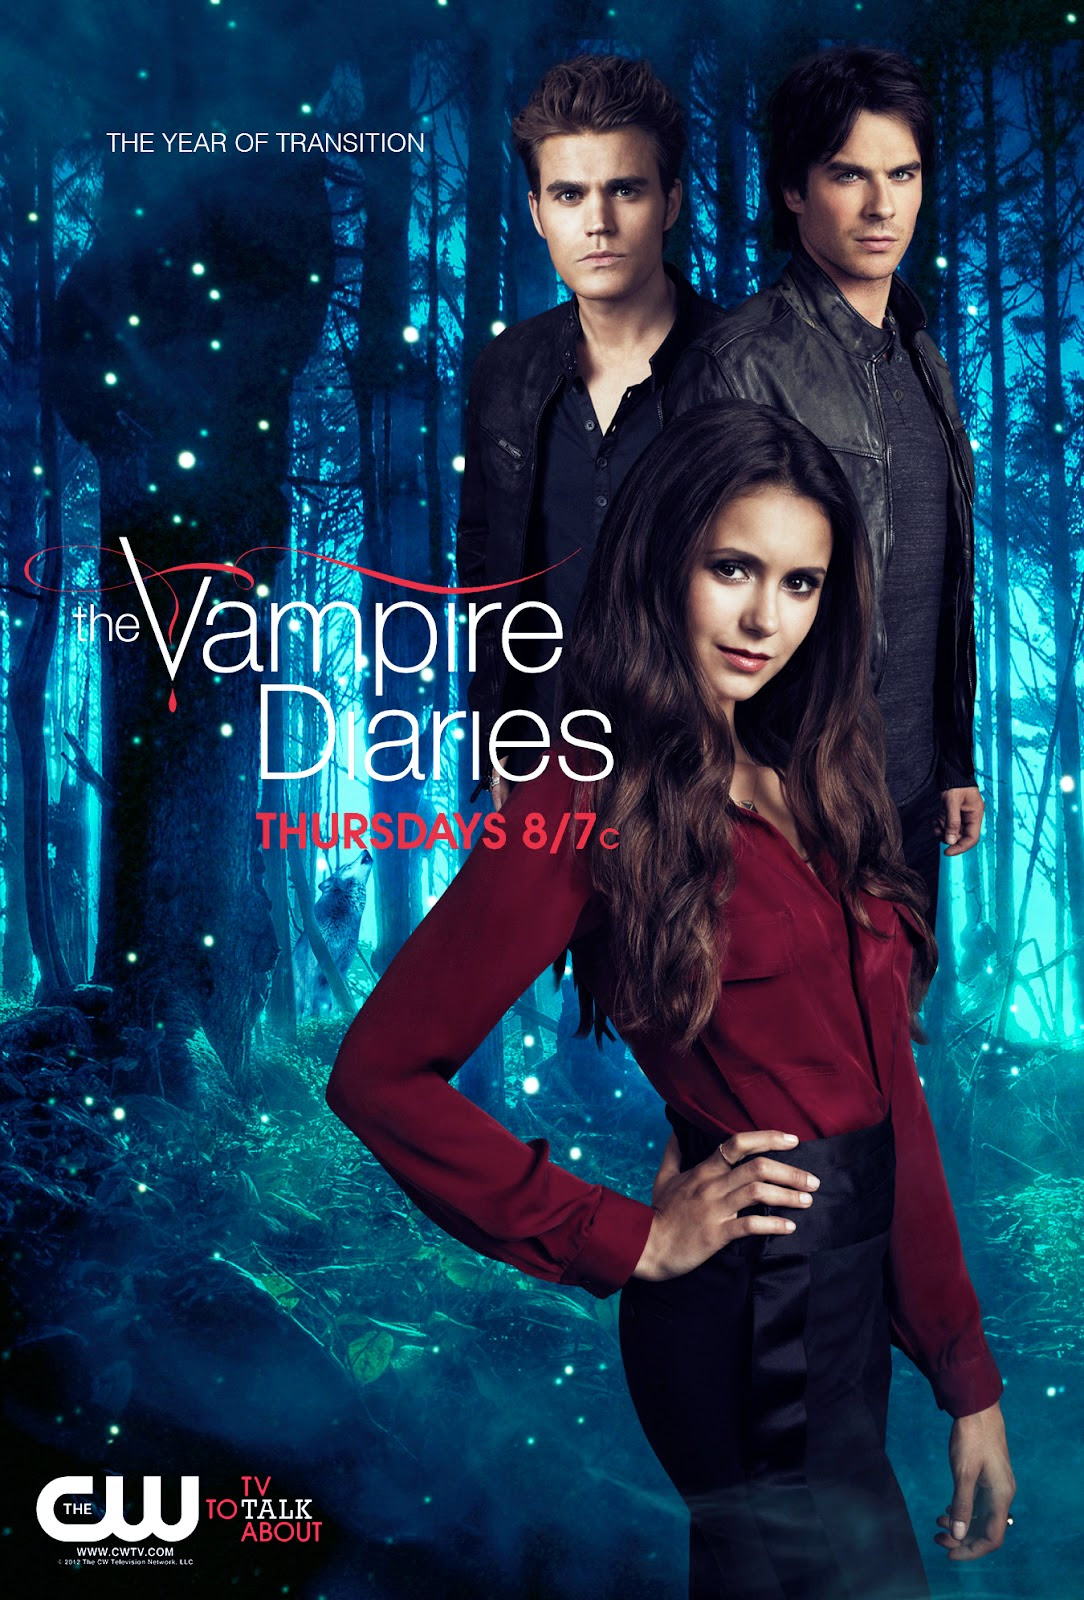 the vampire diaries sezonul 8 online gratis subtitrat ep 10